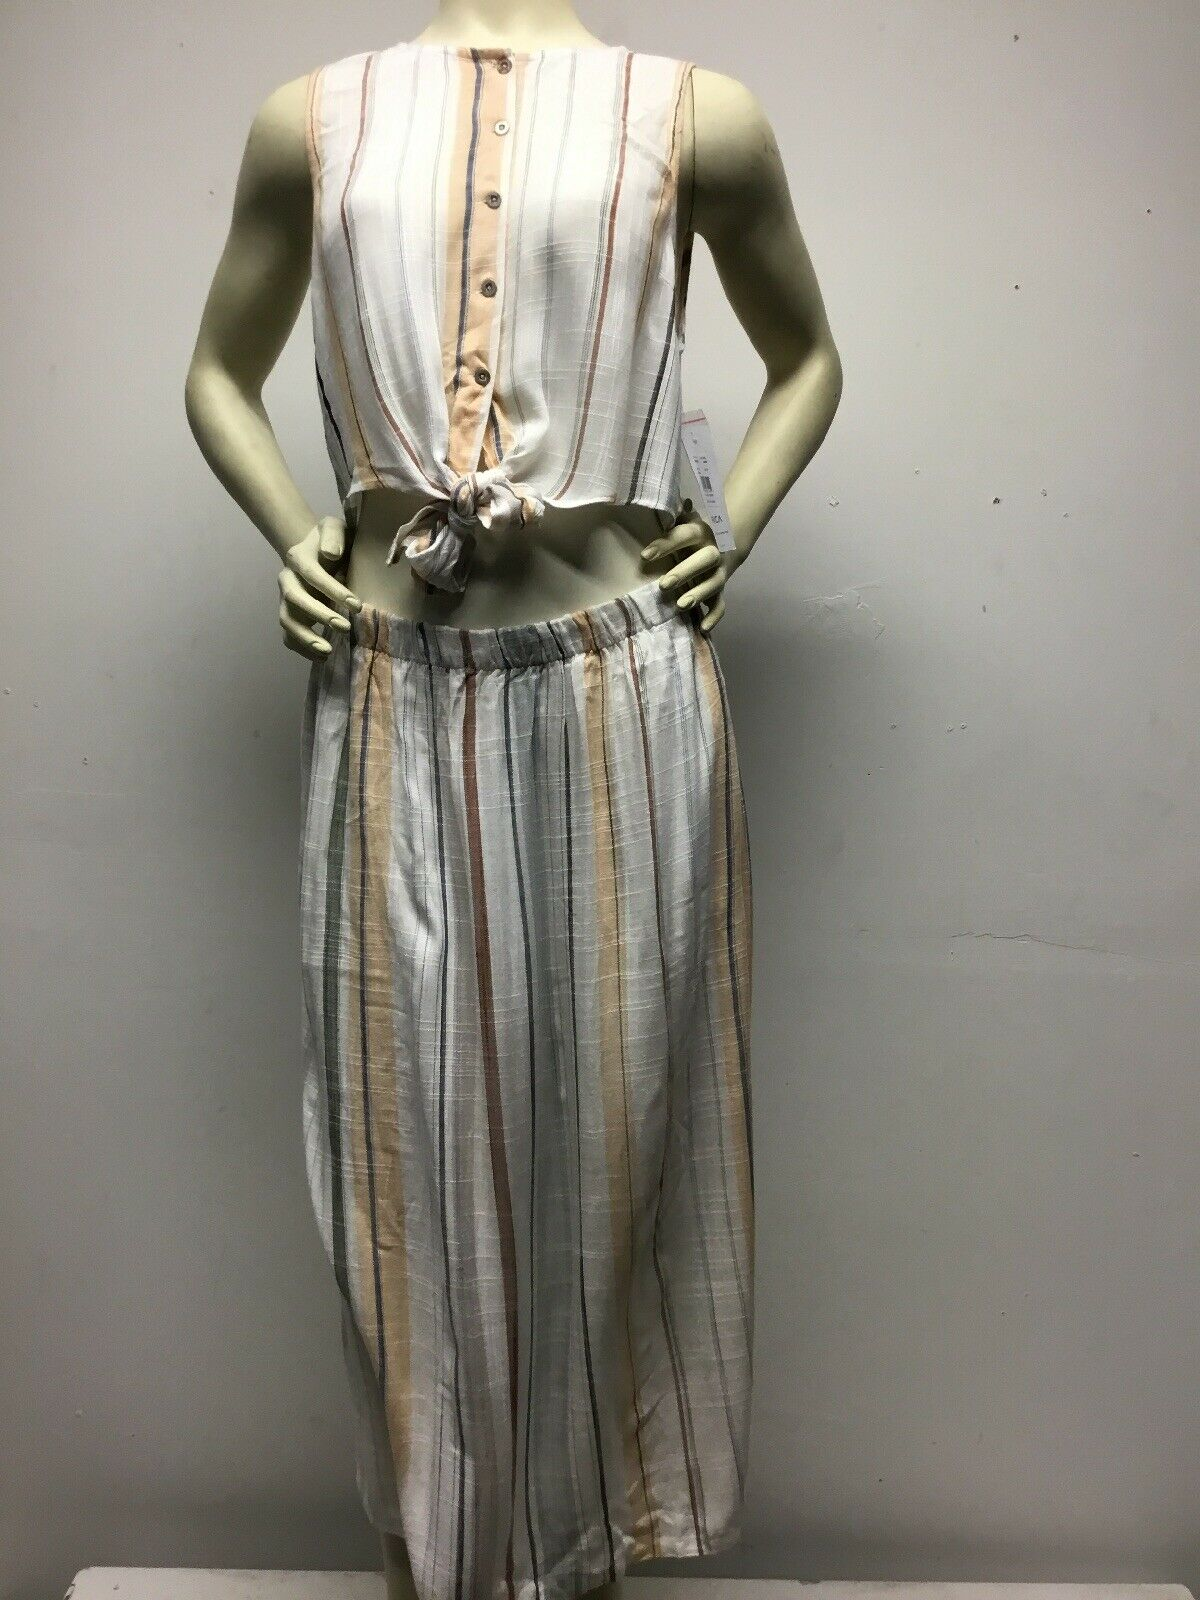 Femme RVCA Arizona Ajustée Midi Robe Taille L Neuf avec étiquettes